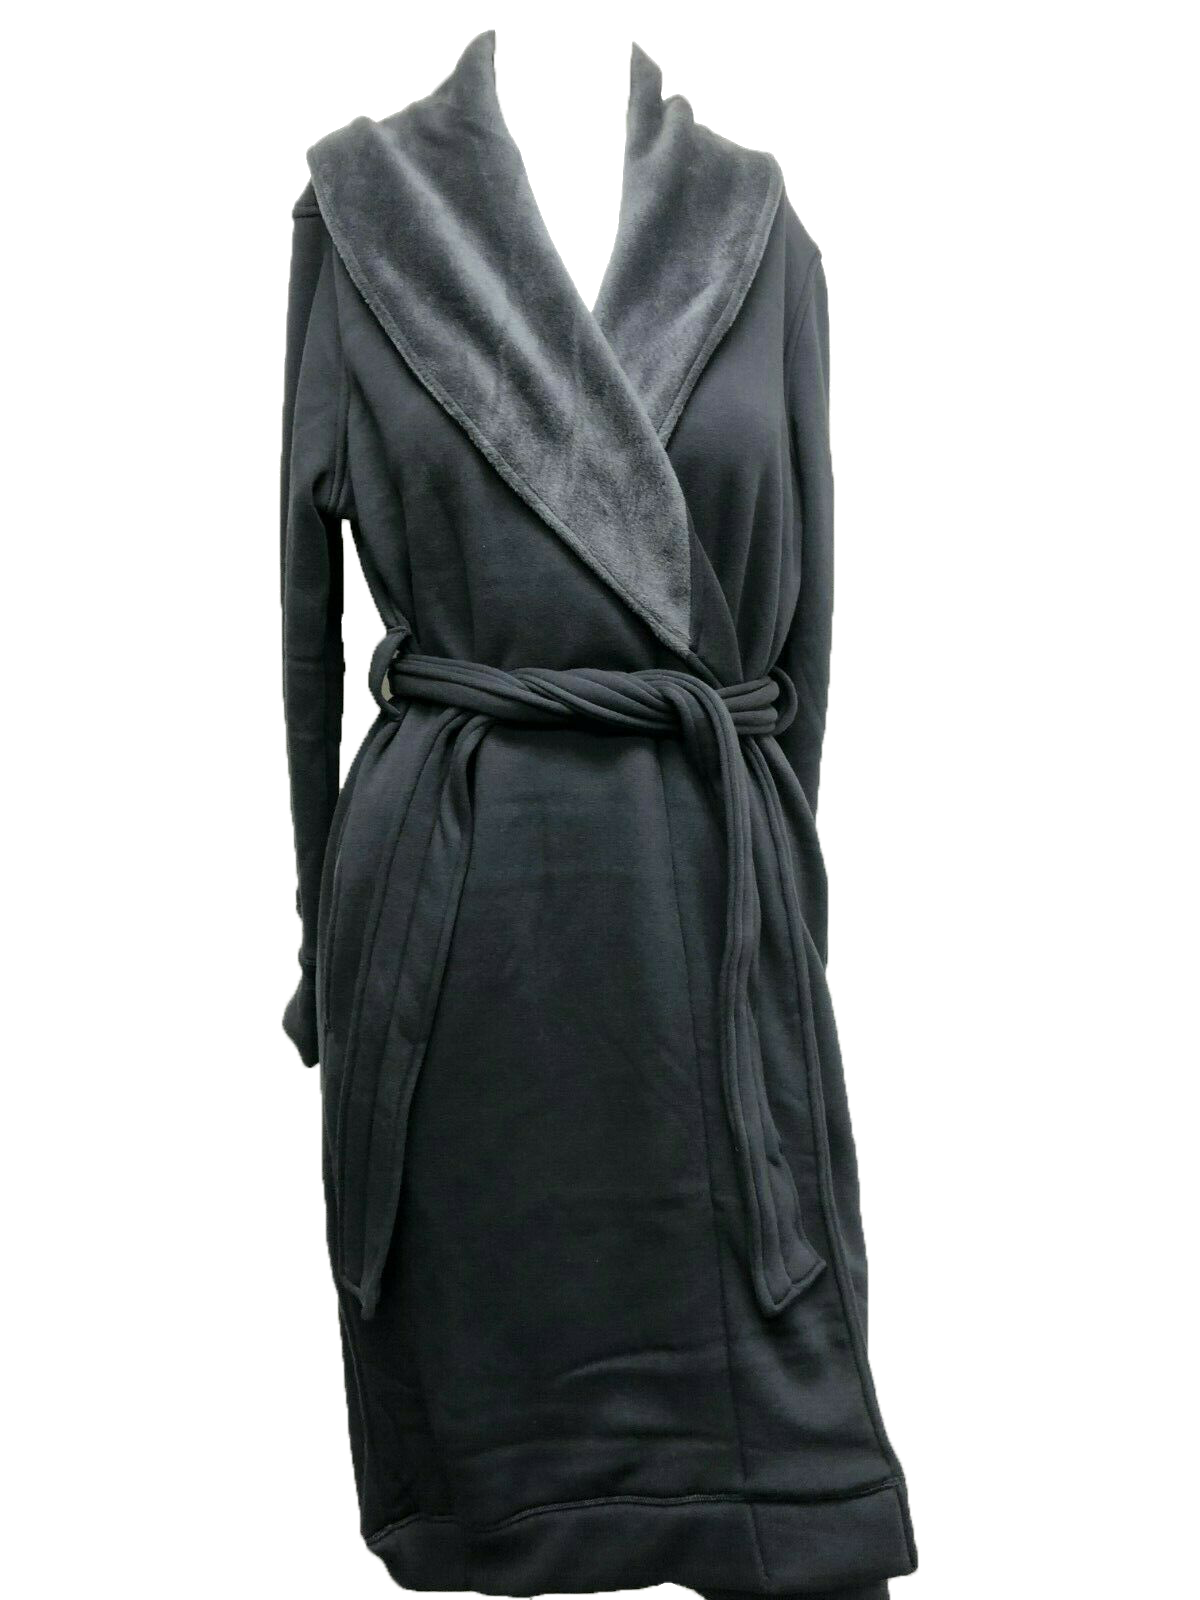 UGG Australia Women's Duffield Robe Spa UA4101W Collar Belted Shawl Long